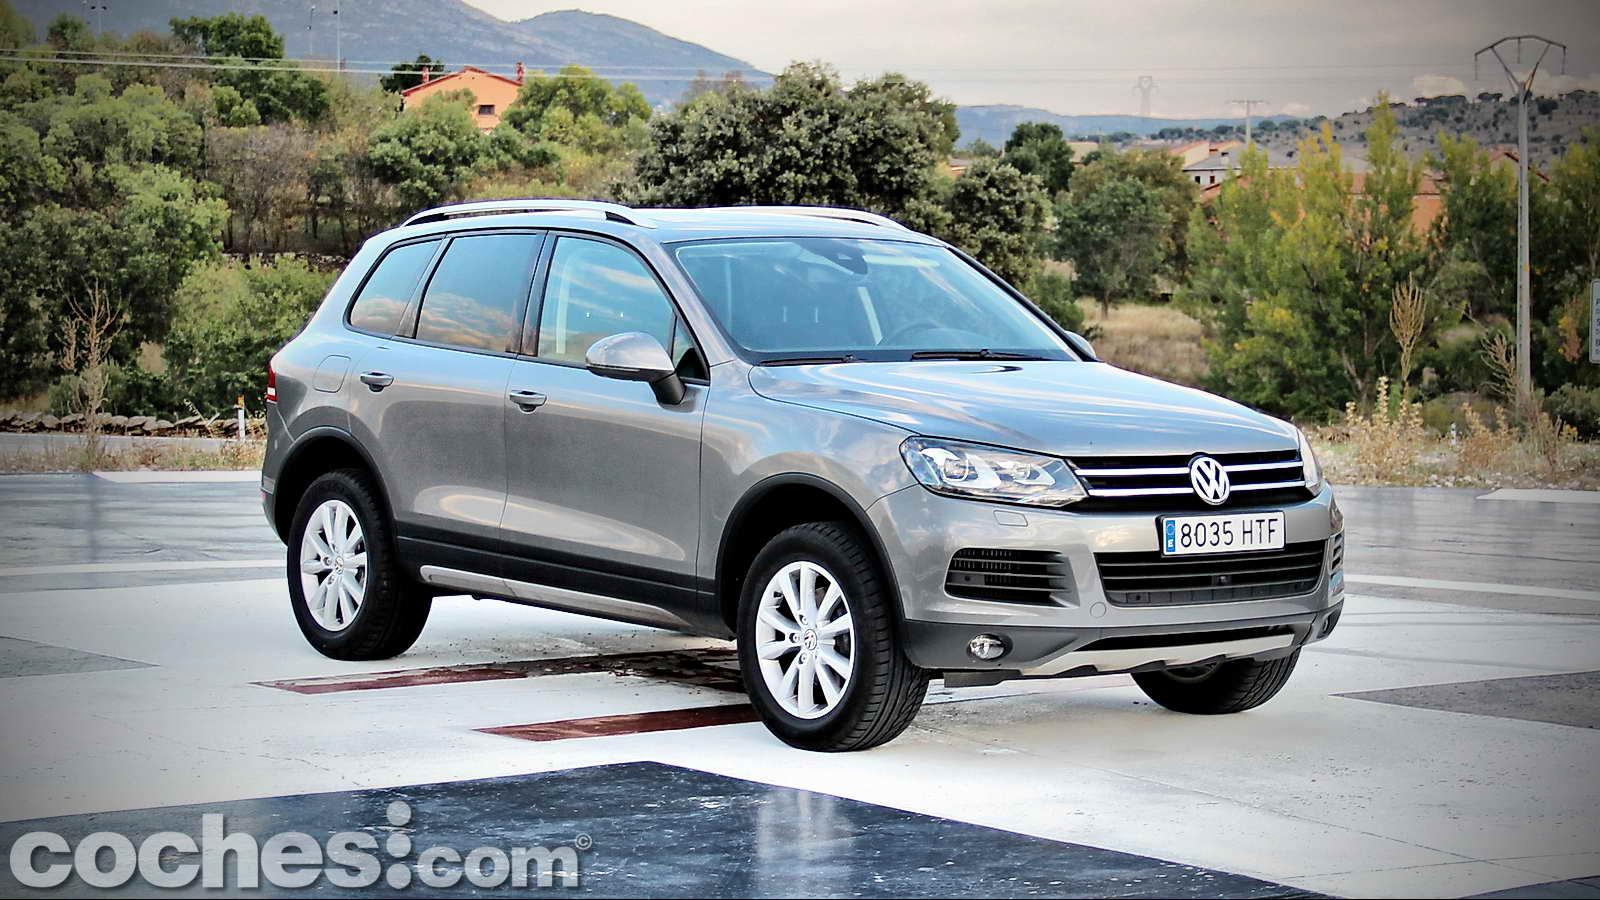 Volkswagen_Touareg_Terrain_Tech_03